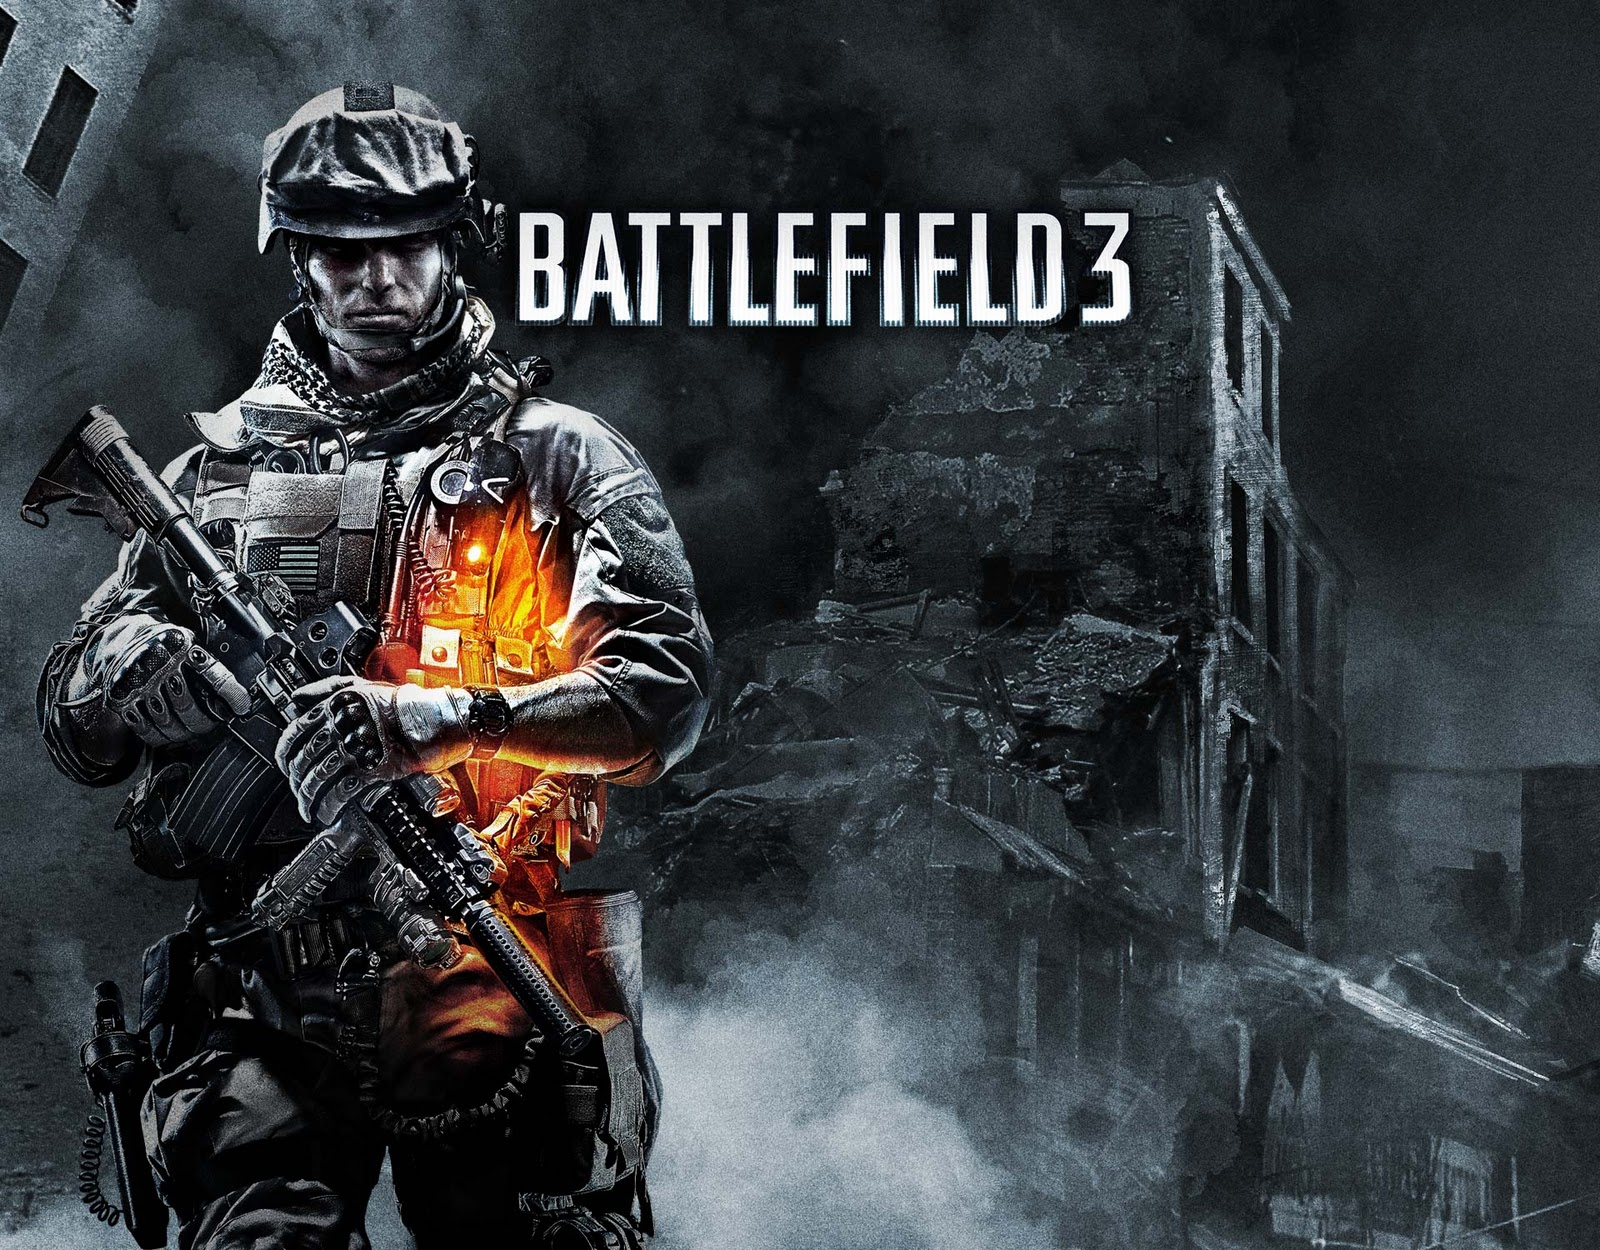 http://2.bp.blogspot.com/-DcLZB8V9epQ/TpfPsdtHfjI/AAAAAAAABSo/hCo25QsdXcE/s1600/Awesome-Battlefield-3-Wallpaper.jpg